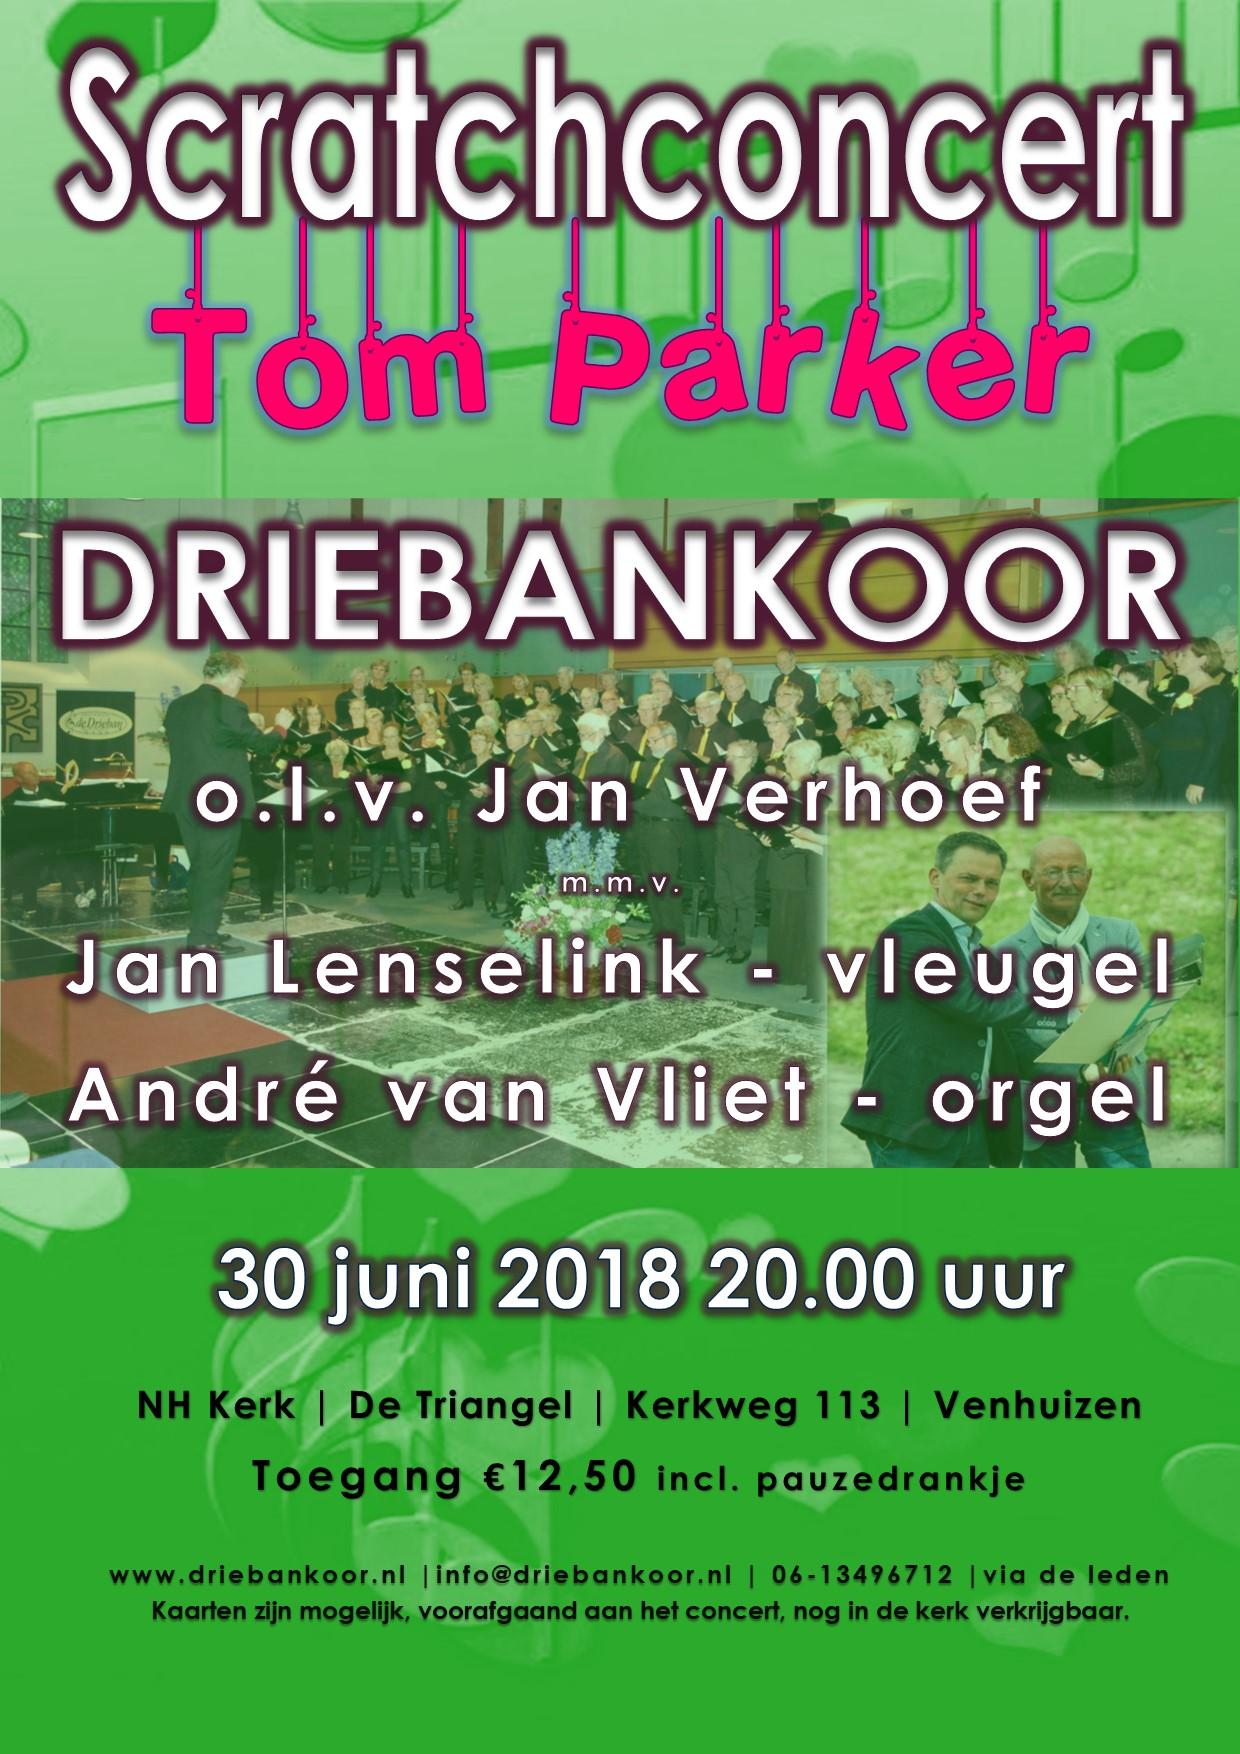 Scratch zomer concert 2018 Driebankoor